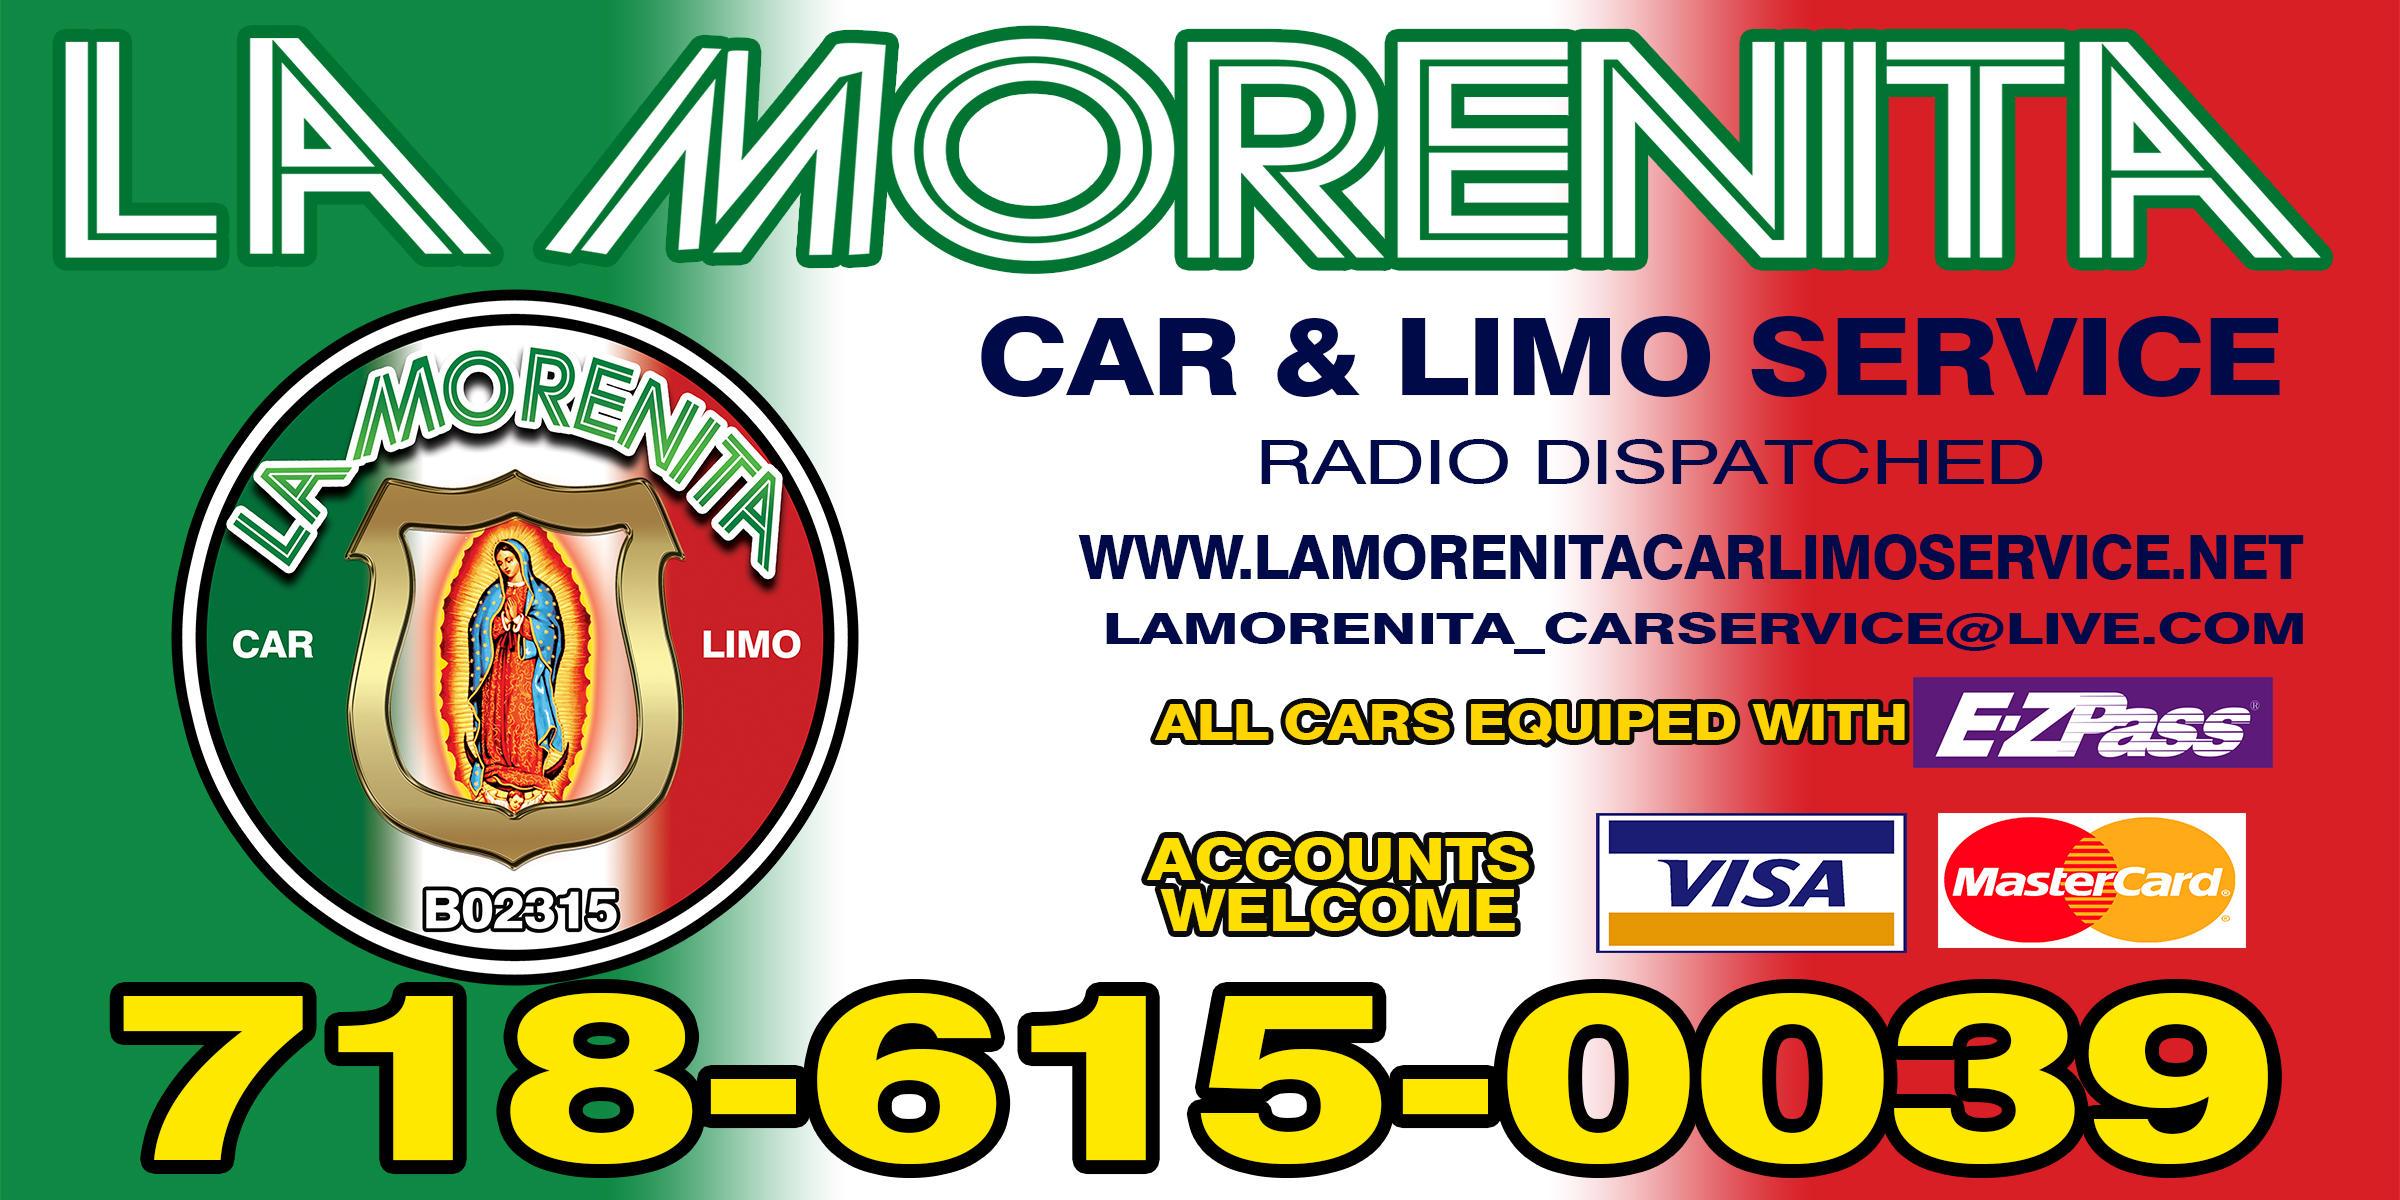 La Morenita Car & Limo Service - Brooklyn, NY 11235 - (718)615-0039 | ShowMeLocal.com